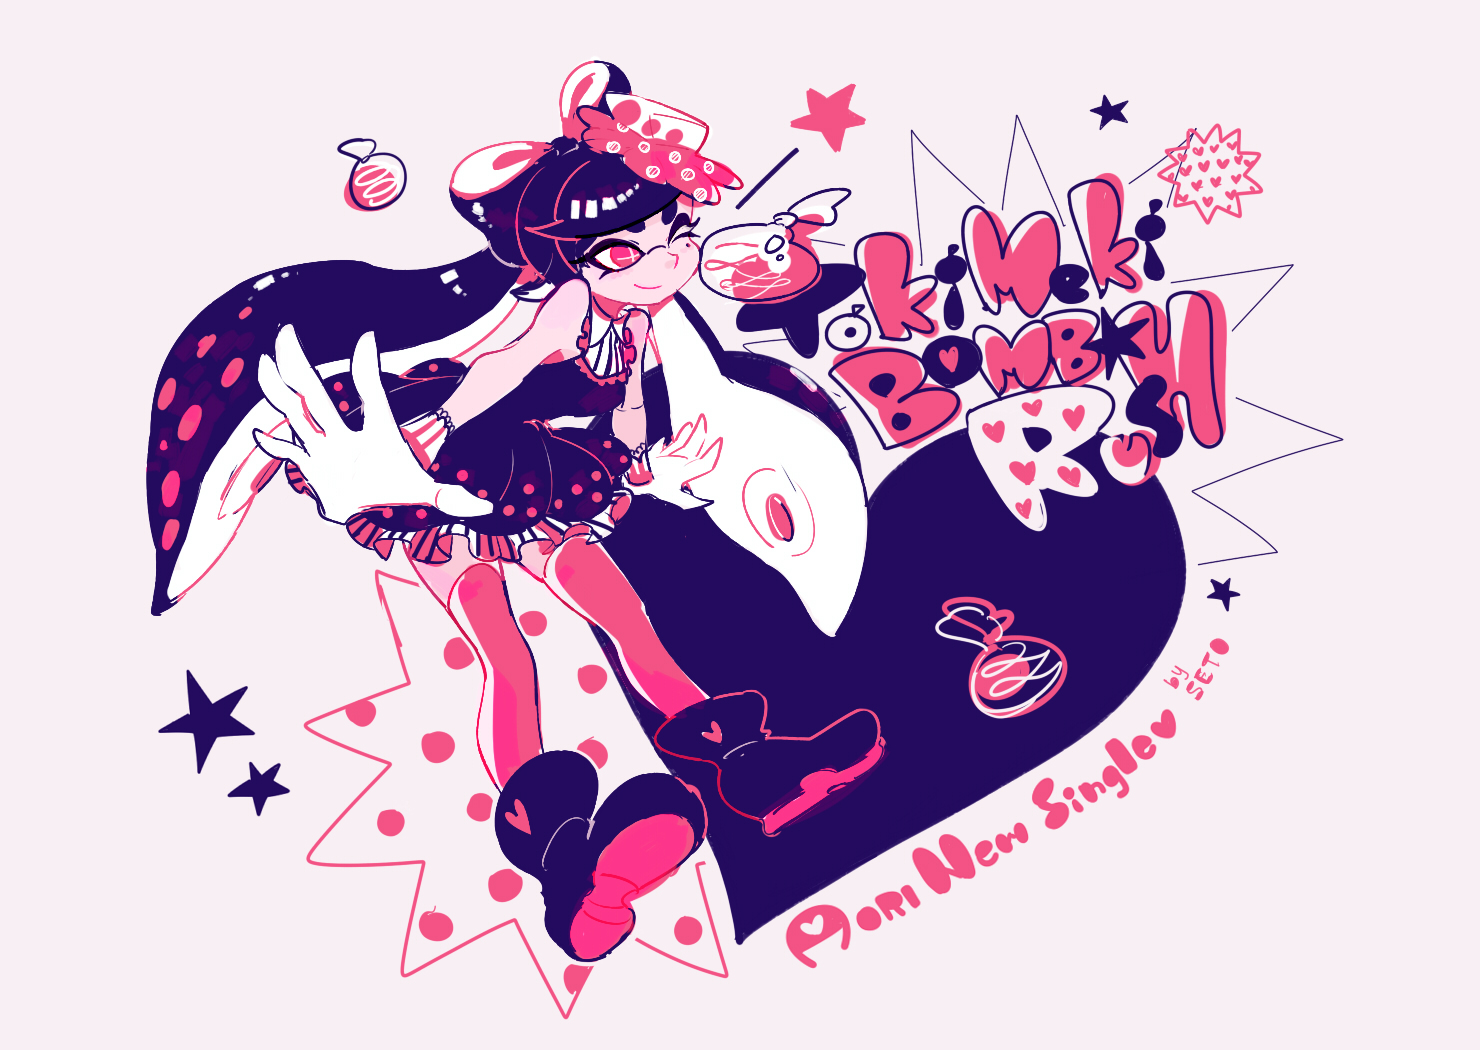 aori splatoon callie splatoon image 2011598 zerochan anime